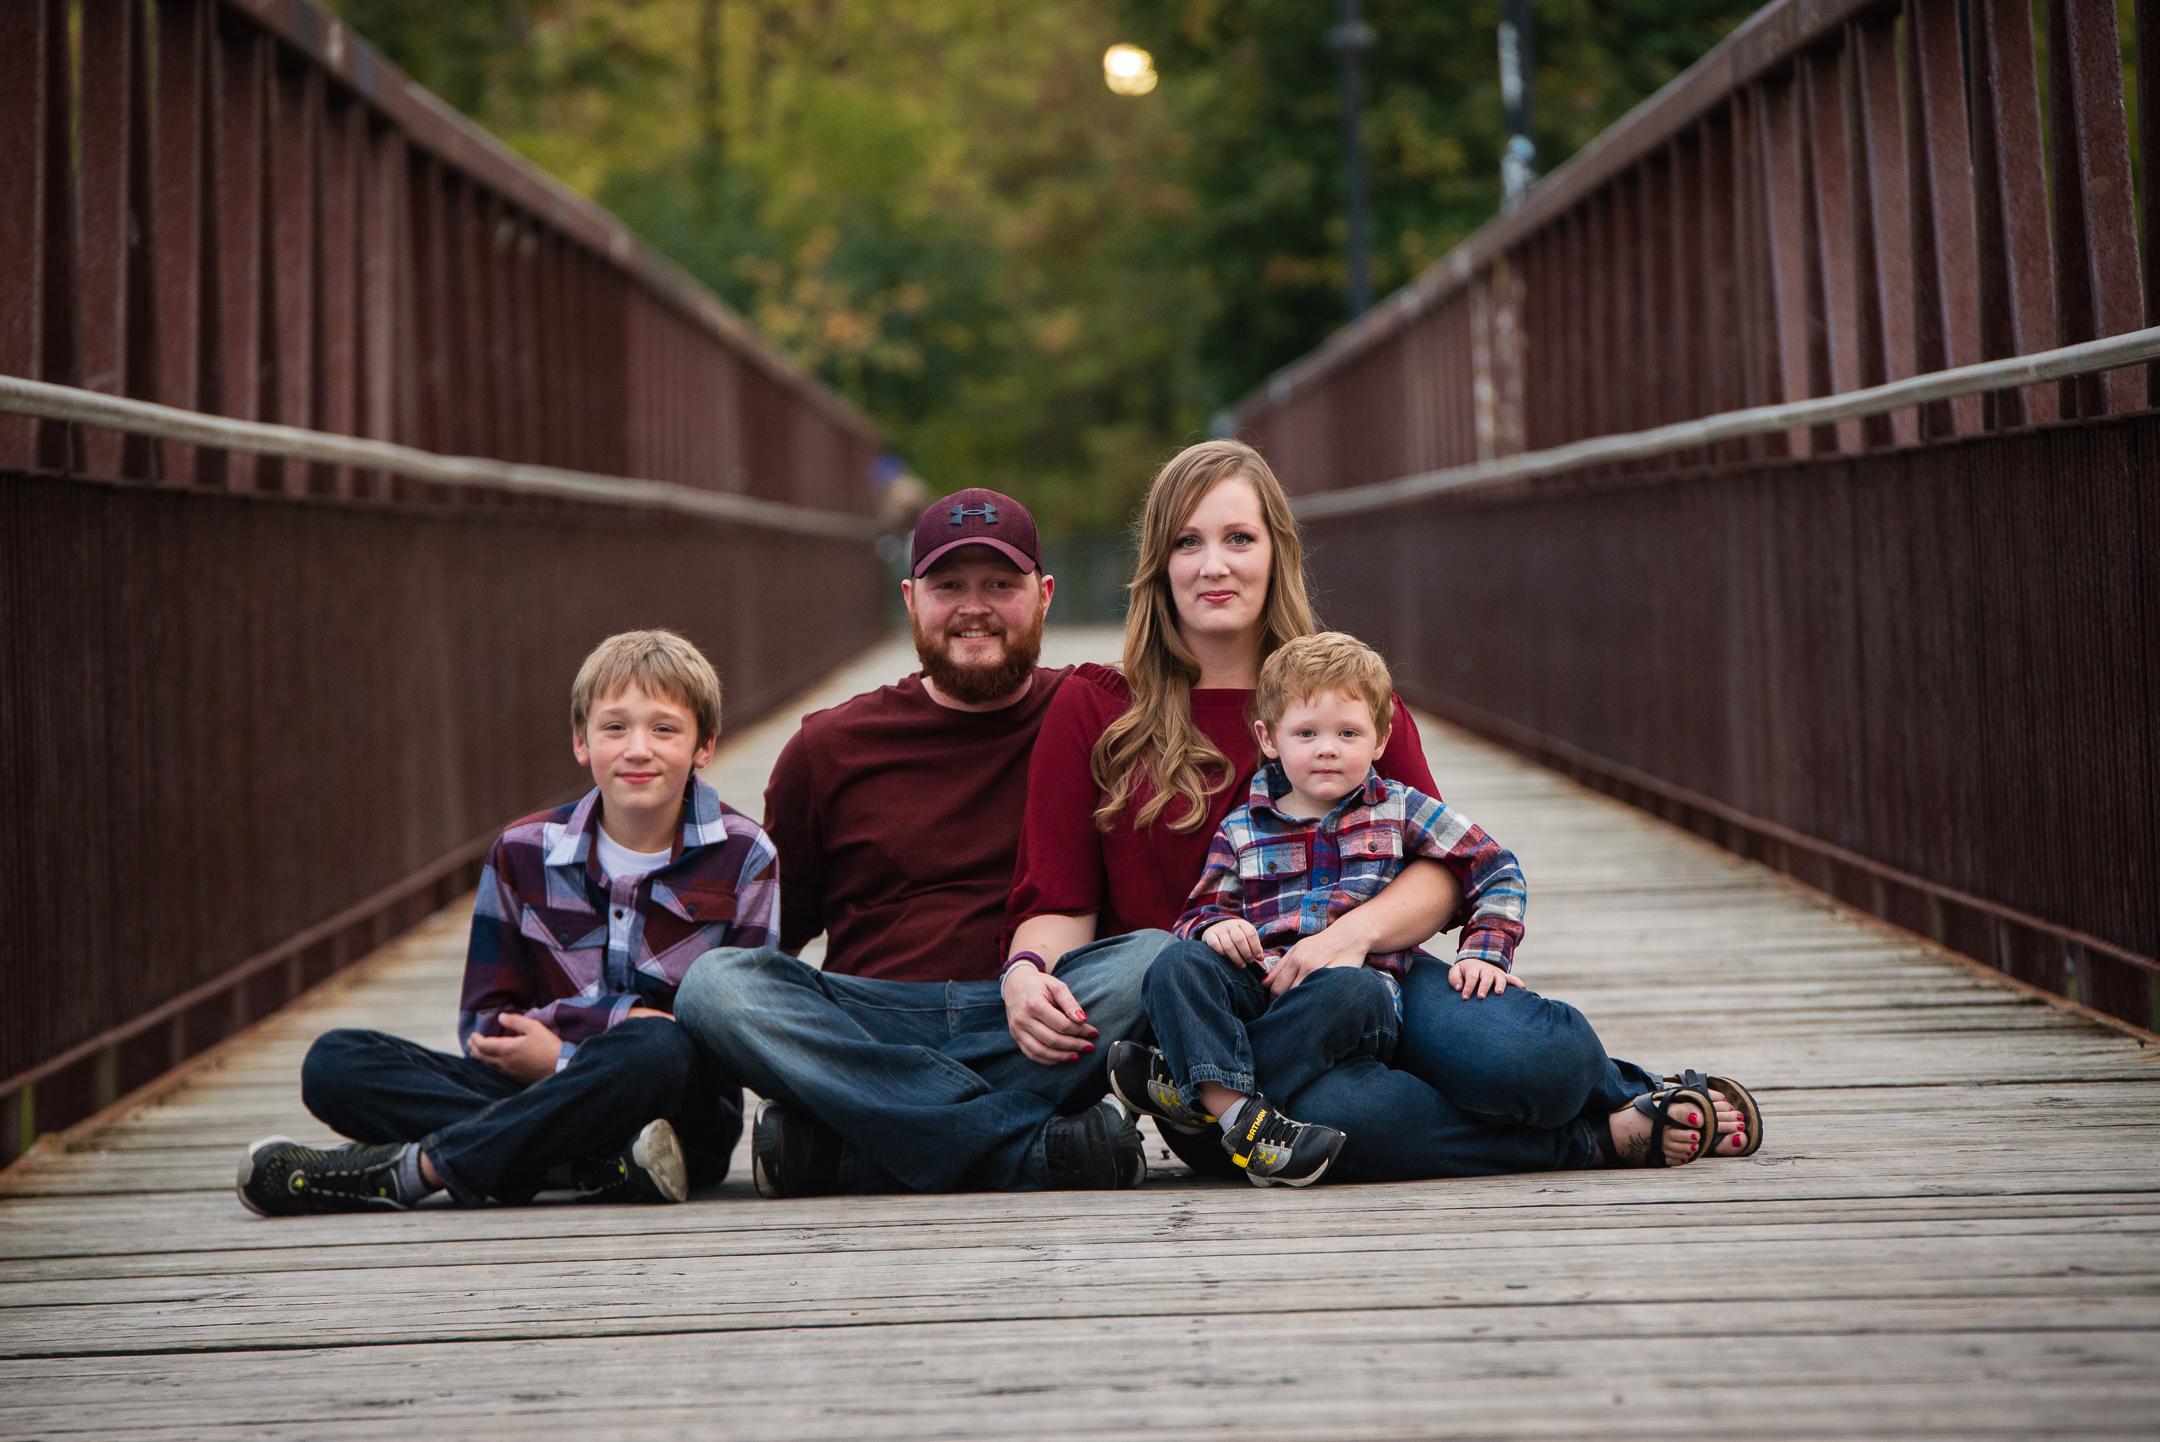 Naomi Lucienne Photography - Family - 171014877.jpg